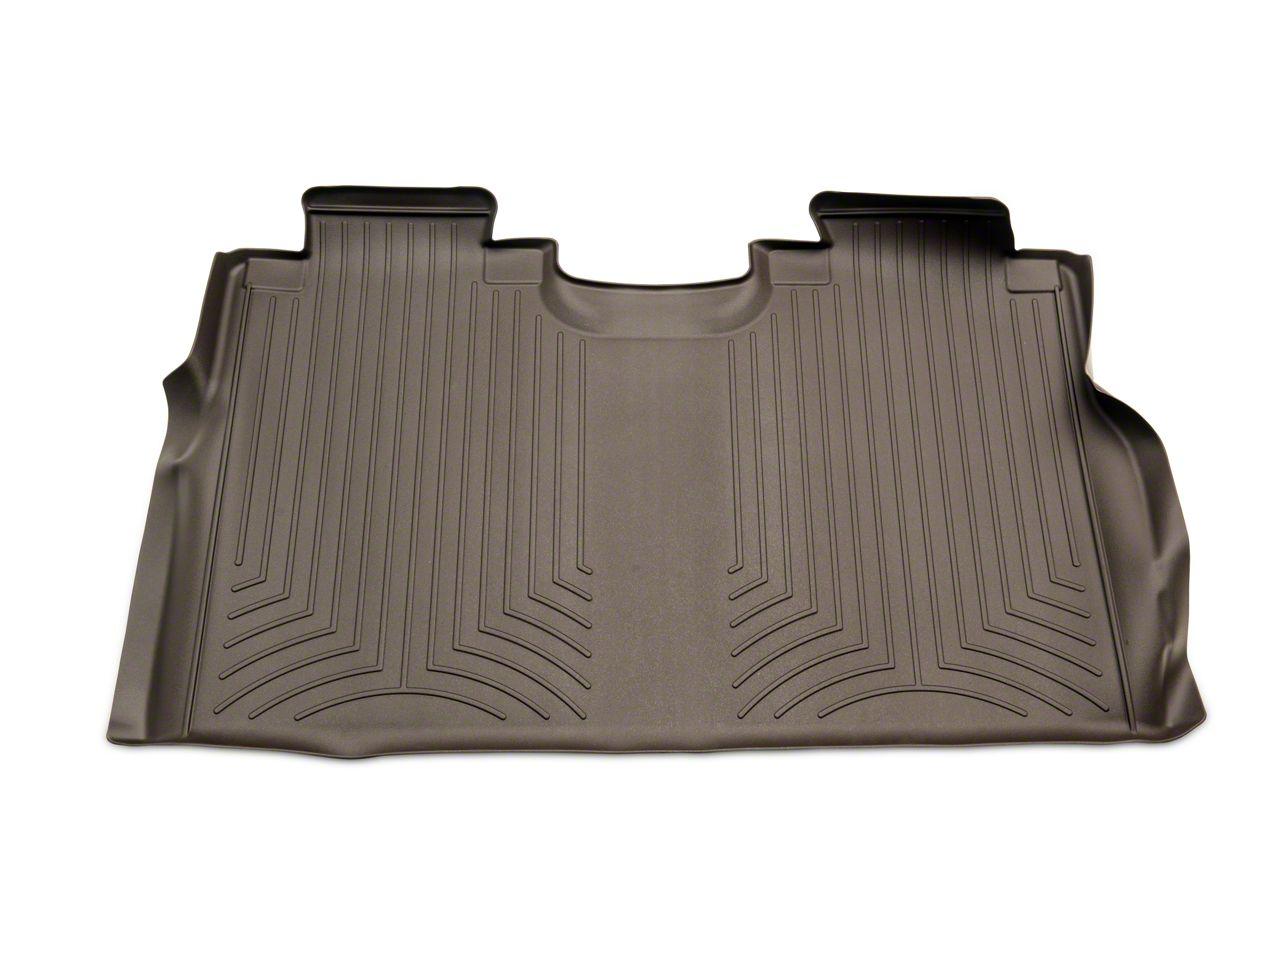 Weathertech DigitalFit Rear Floor Liner - Cocoa (15-19 F-150 SuperCrew w/ Front Bucket Seats)